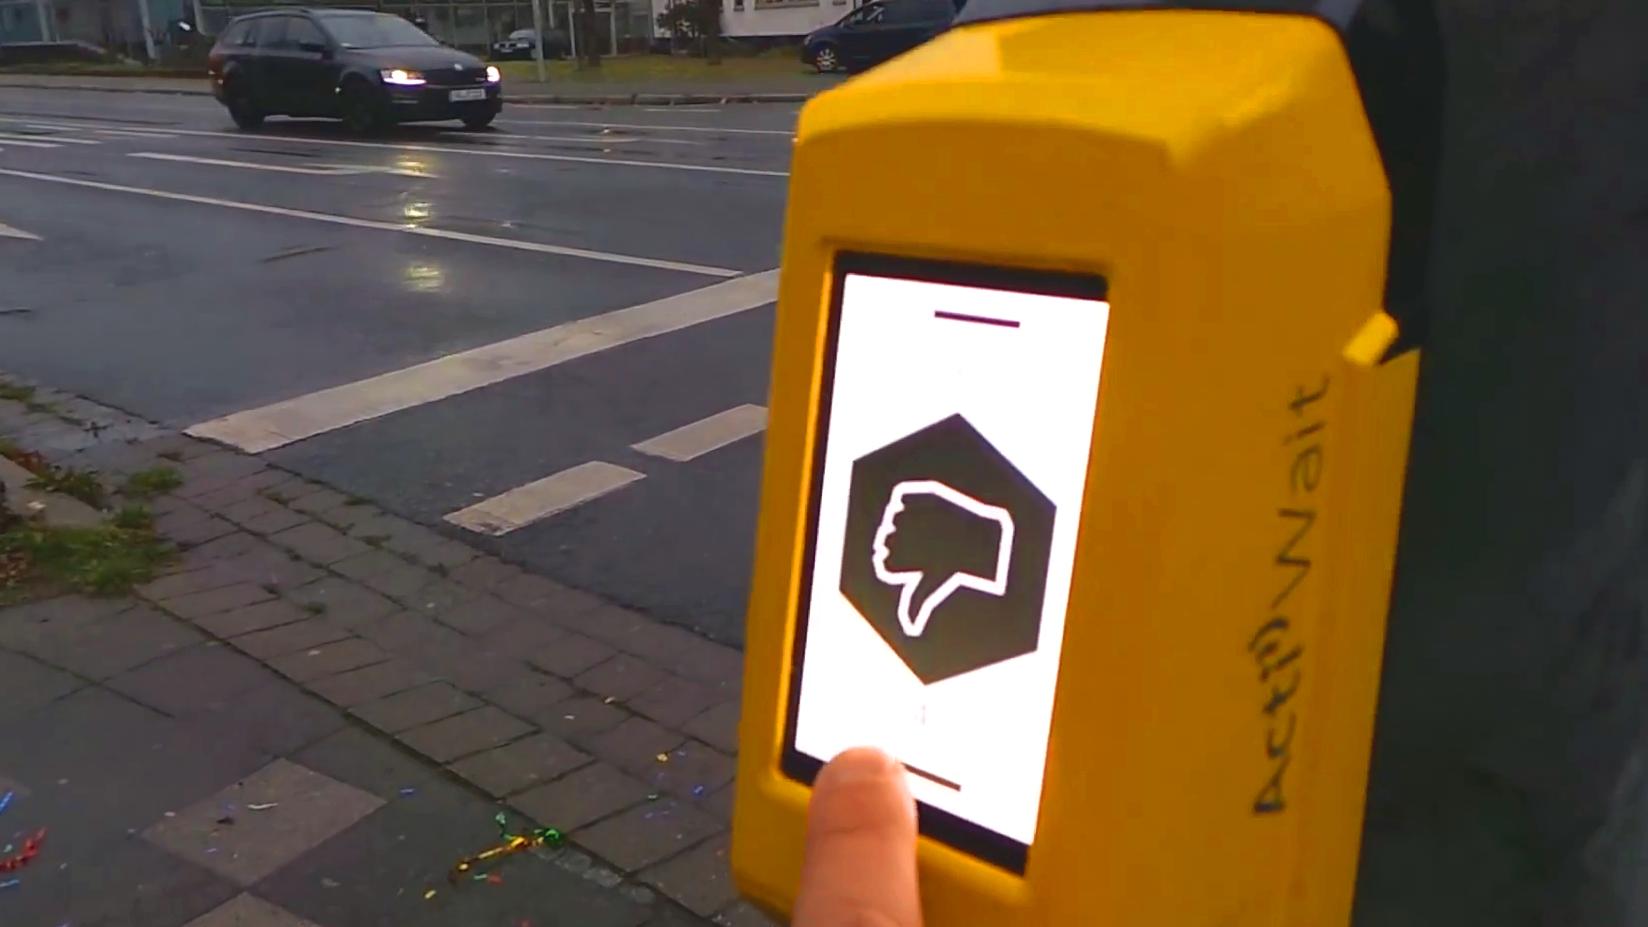 Screenshot_dbate.de_FLASH_Hildesheim_Ampel_1